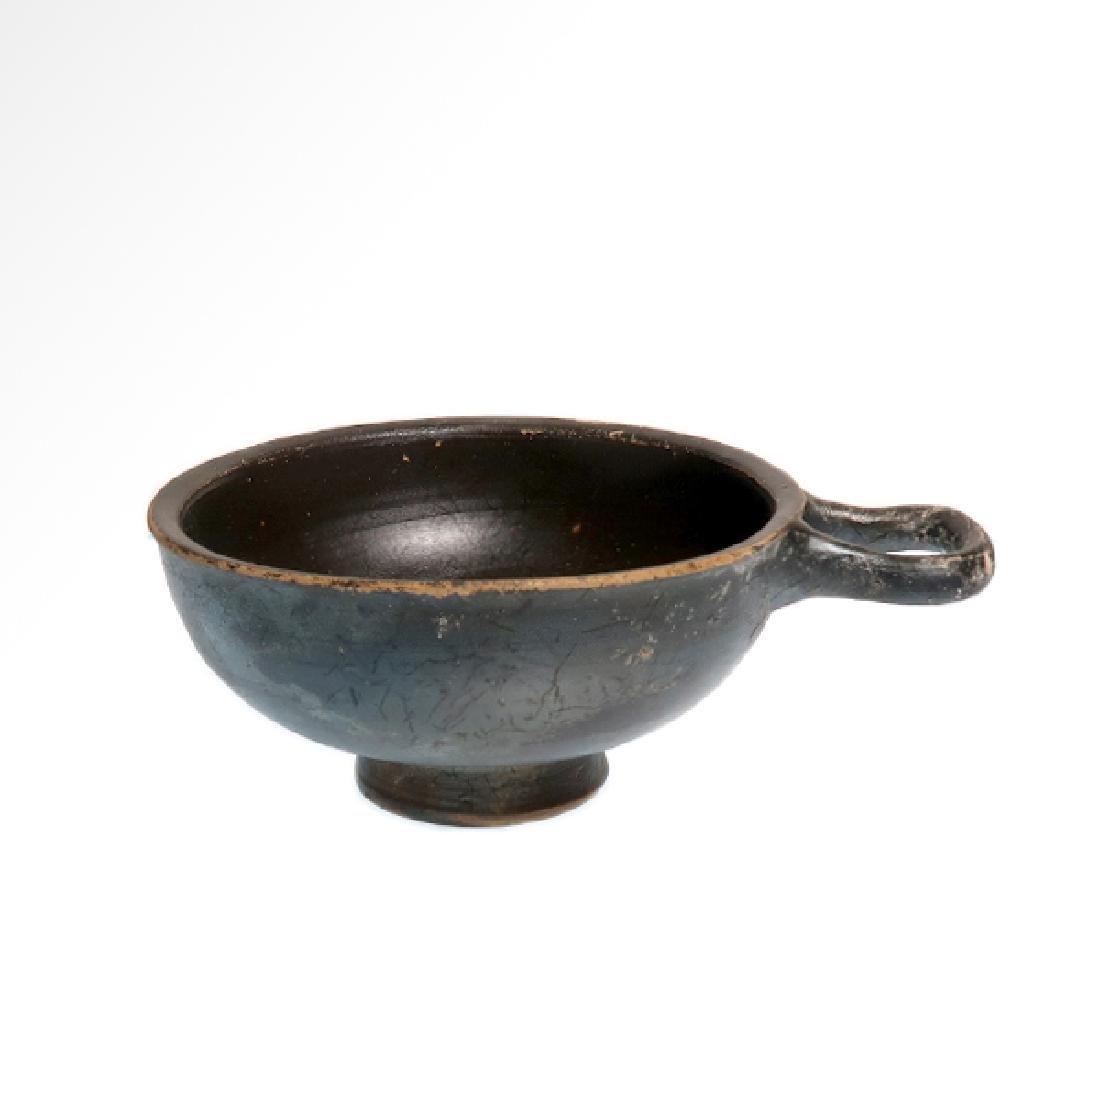 Greek Glazed Pottery cup, c. 350 BC